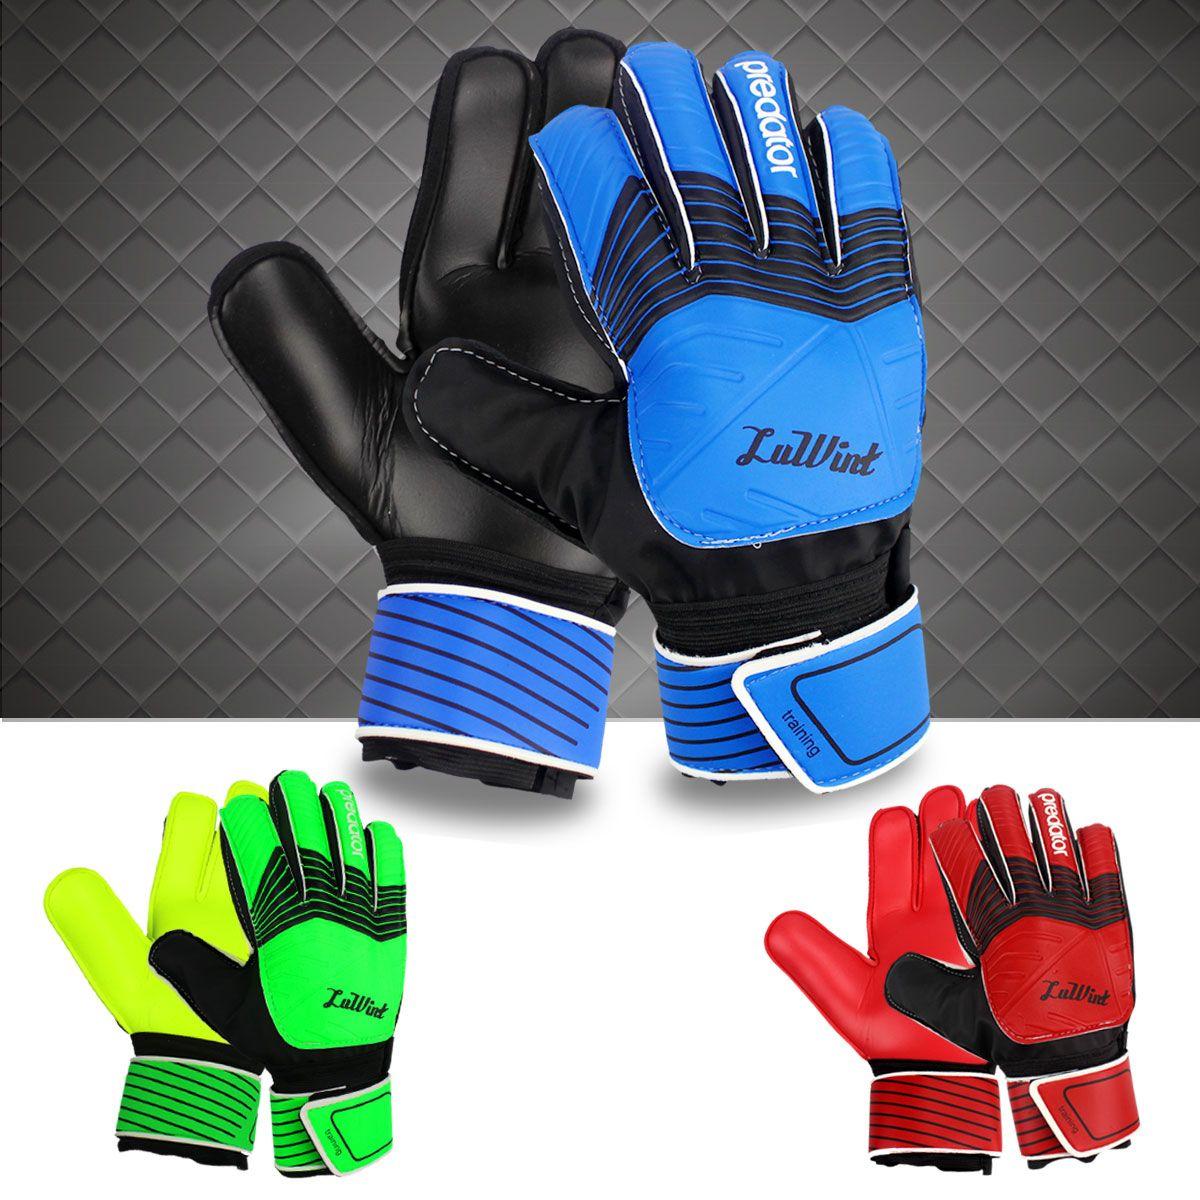 2016 New Adult male Genuine 5H-871 Back PU Soccer Goalkeeper Gloves Men's gloves with finger guard Slip resistant Professional Latex palm